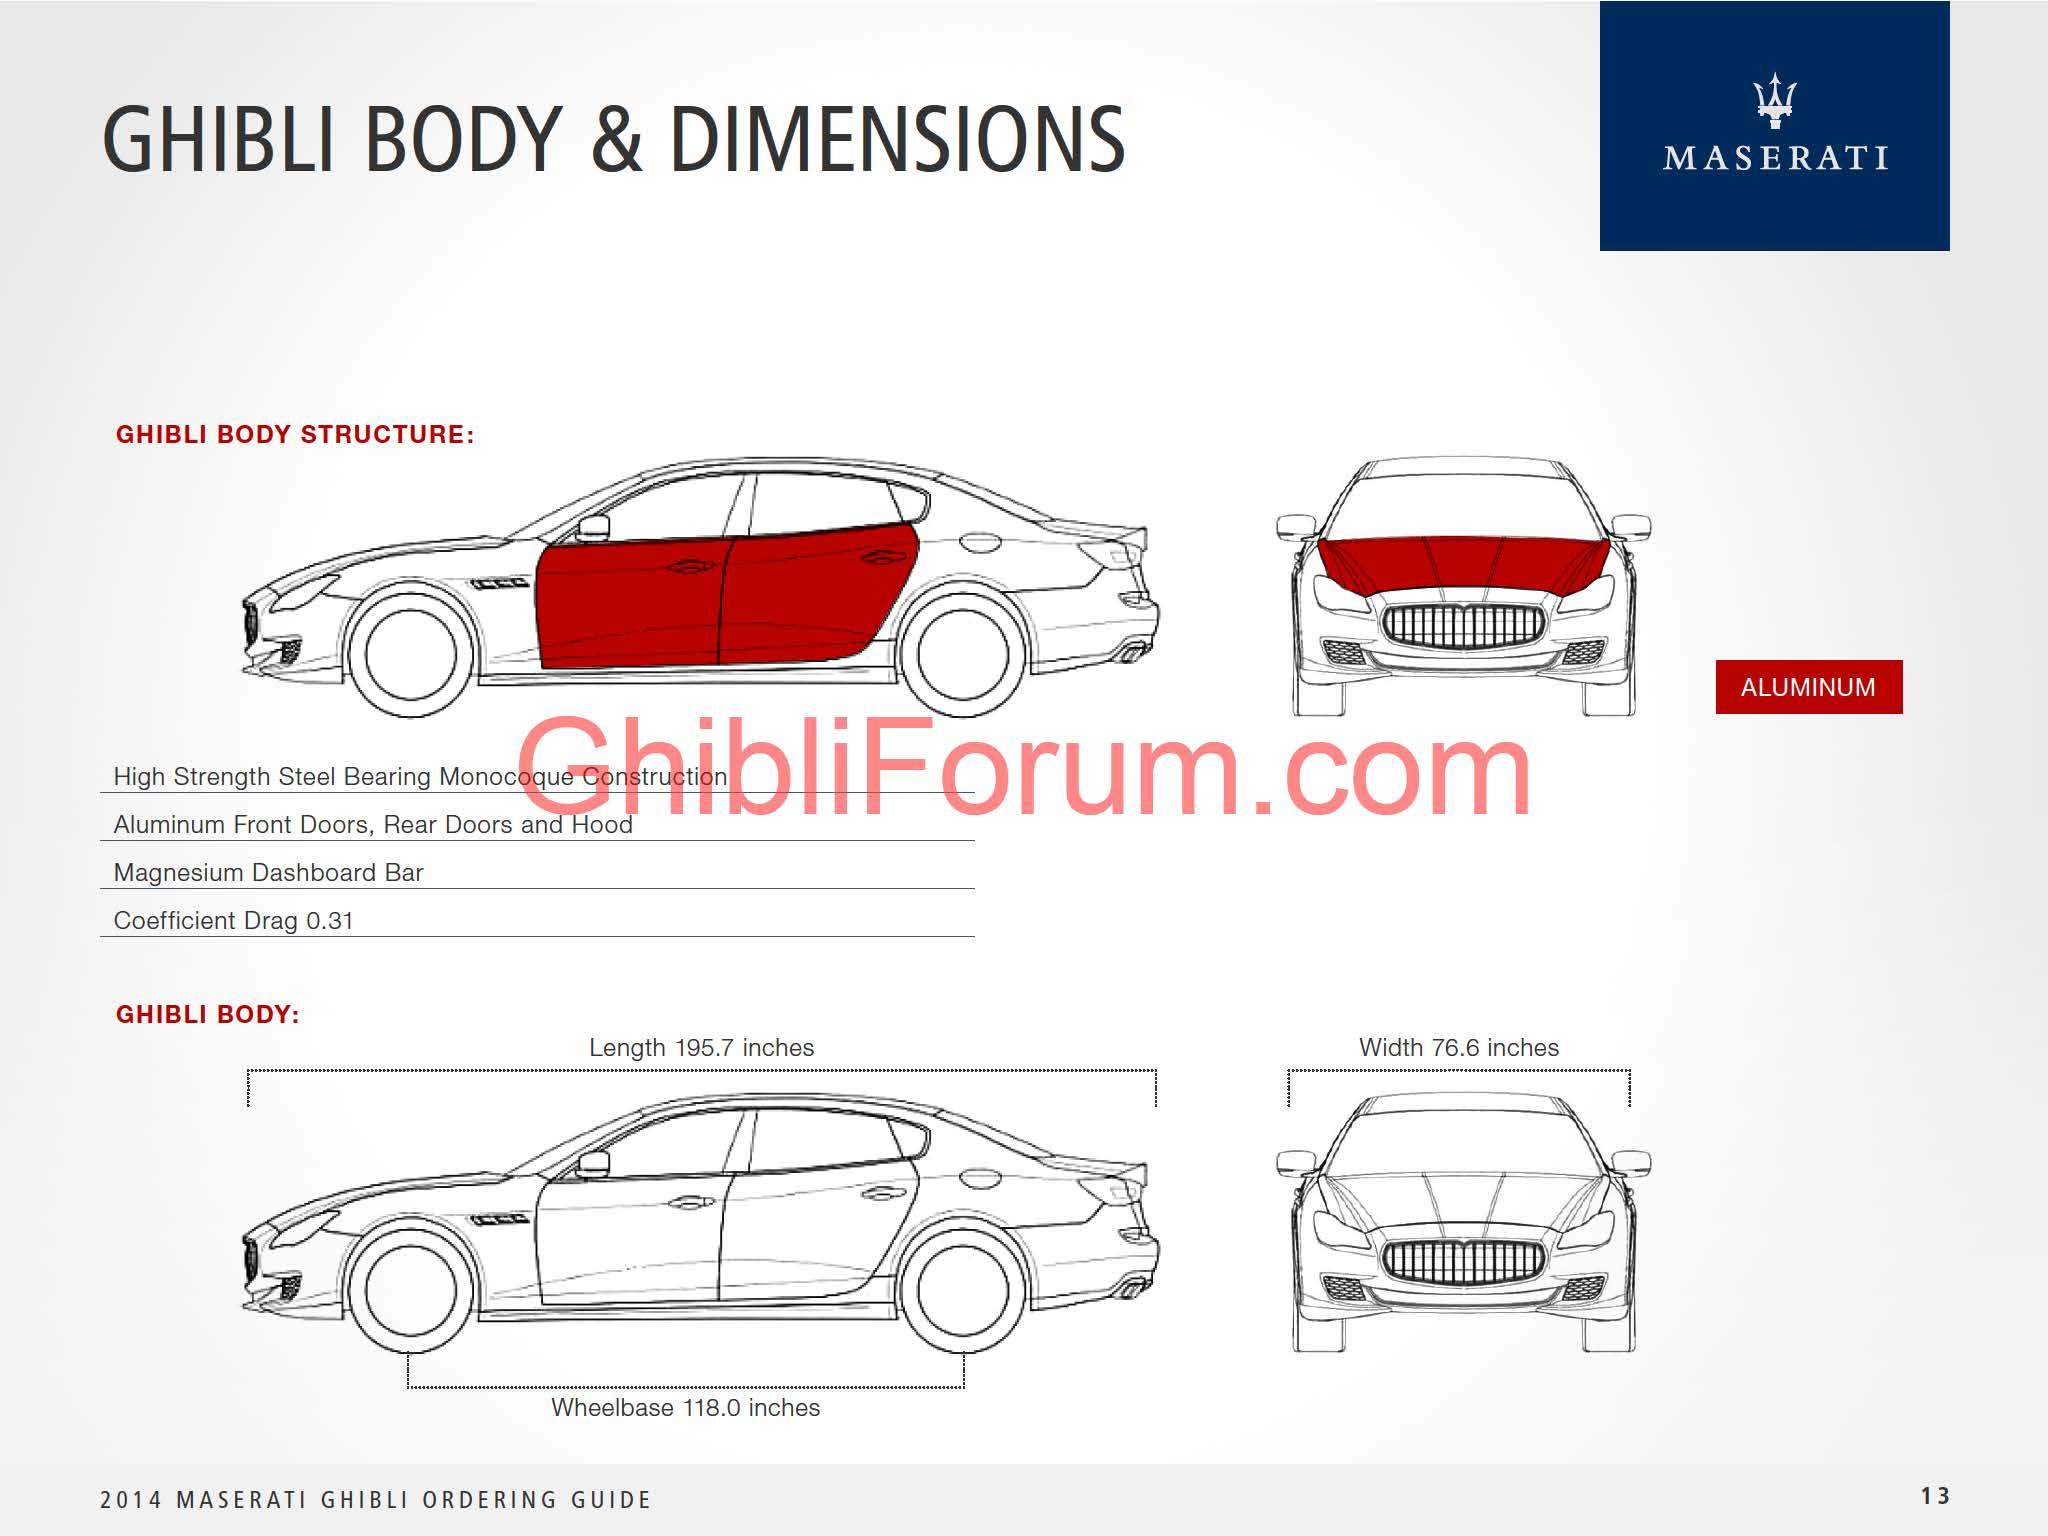 2014 Maserati Ghibli order guide #16/23